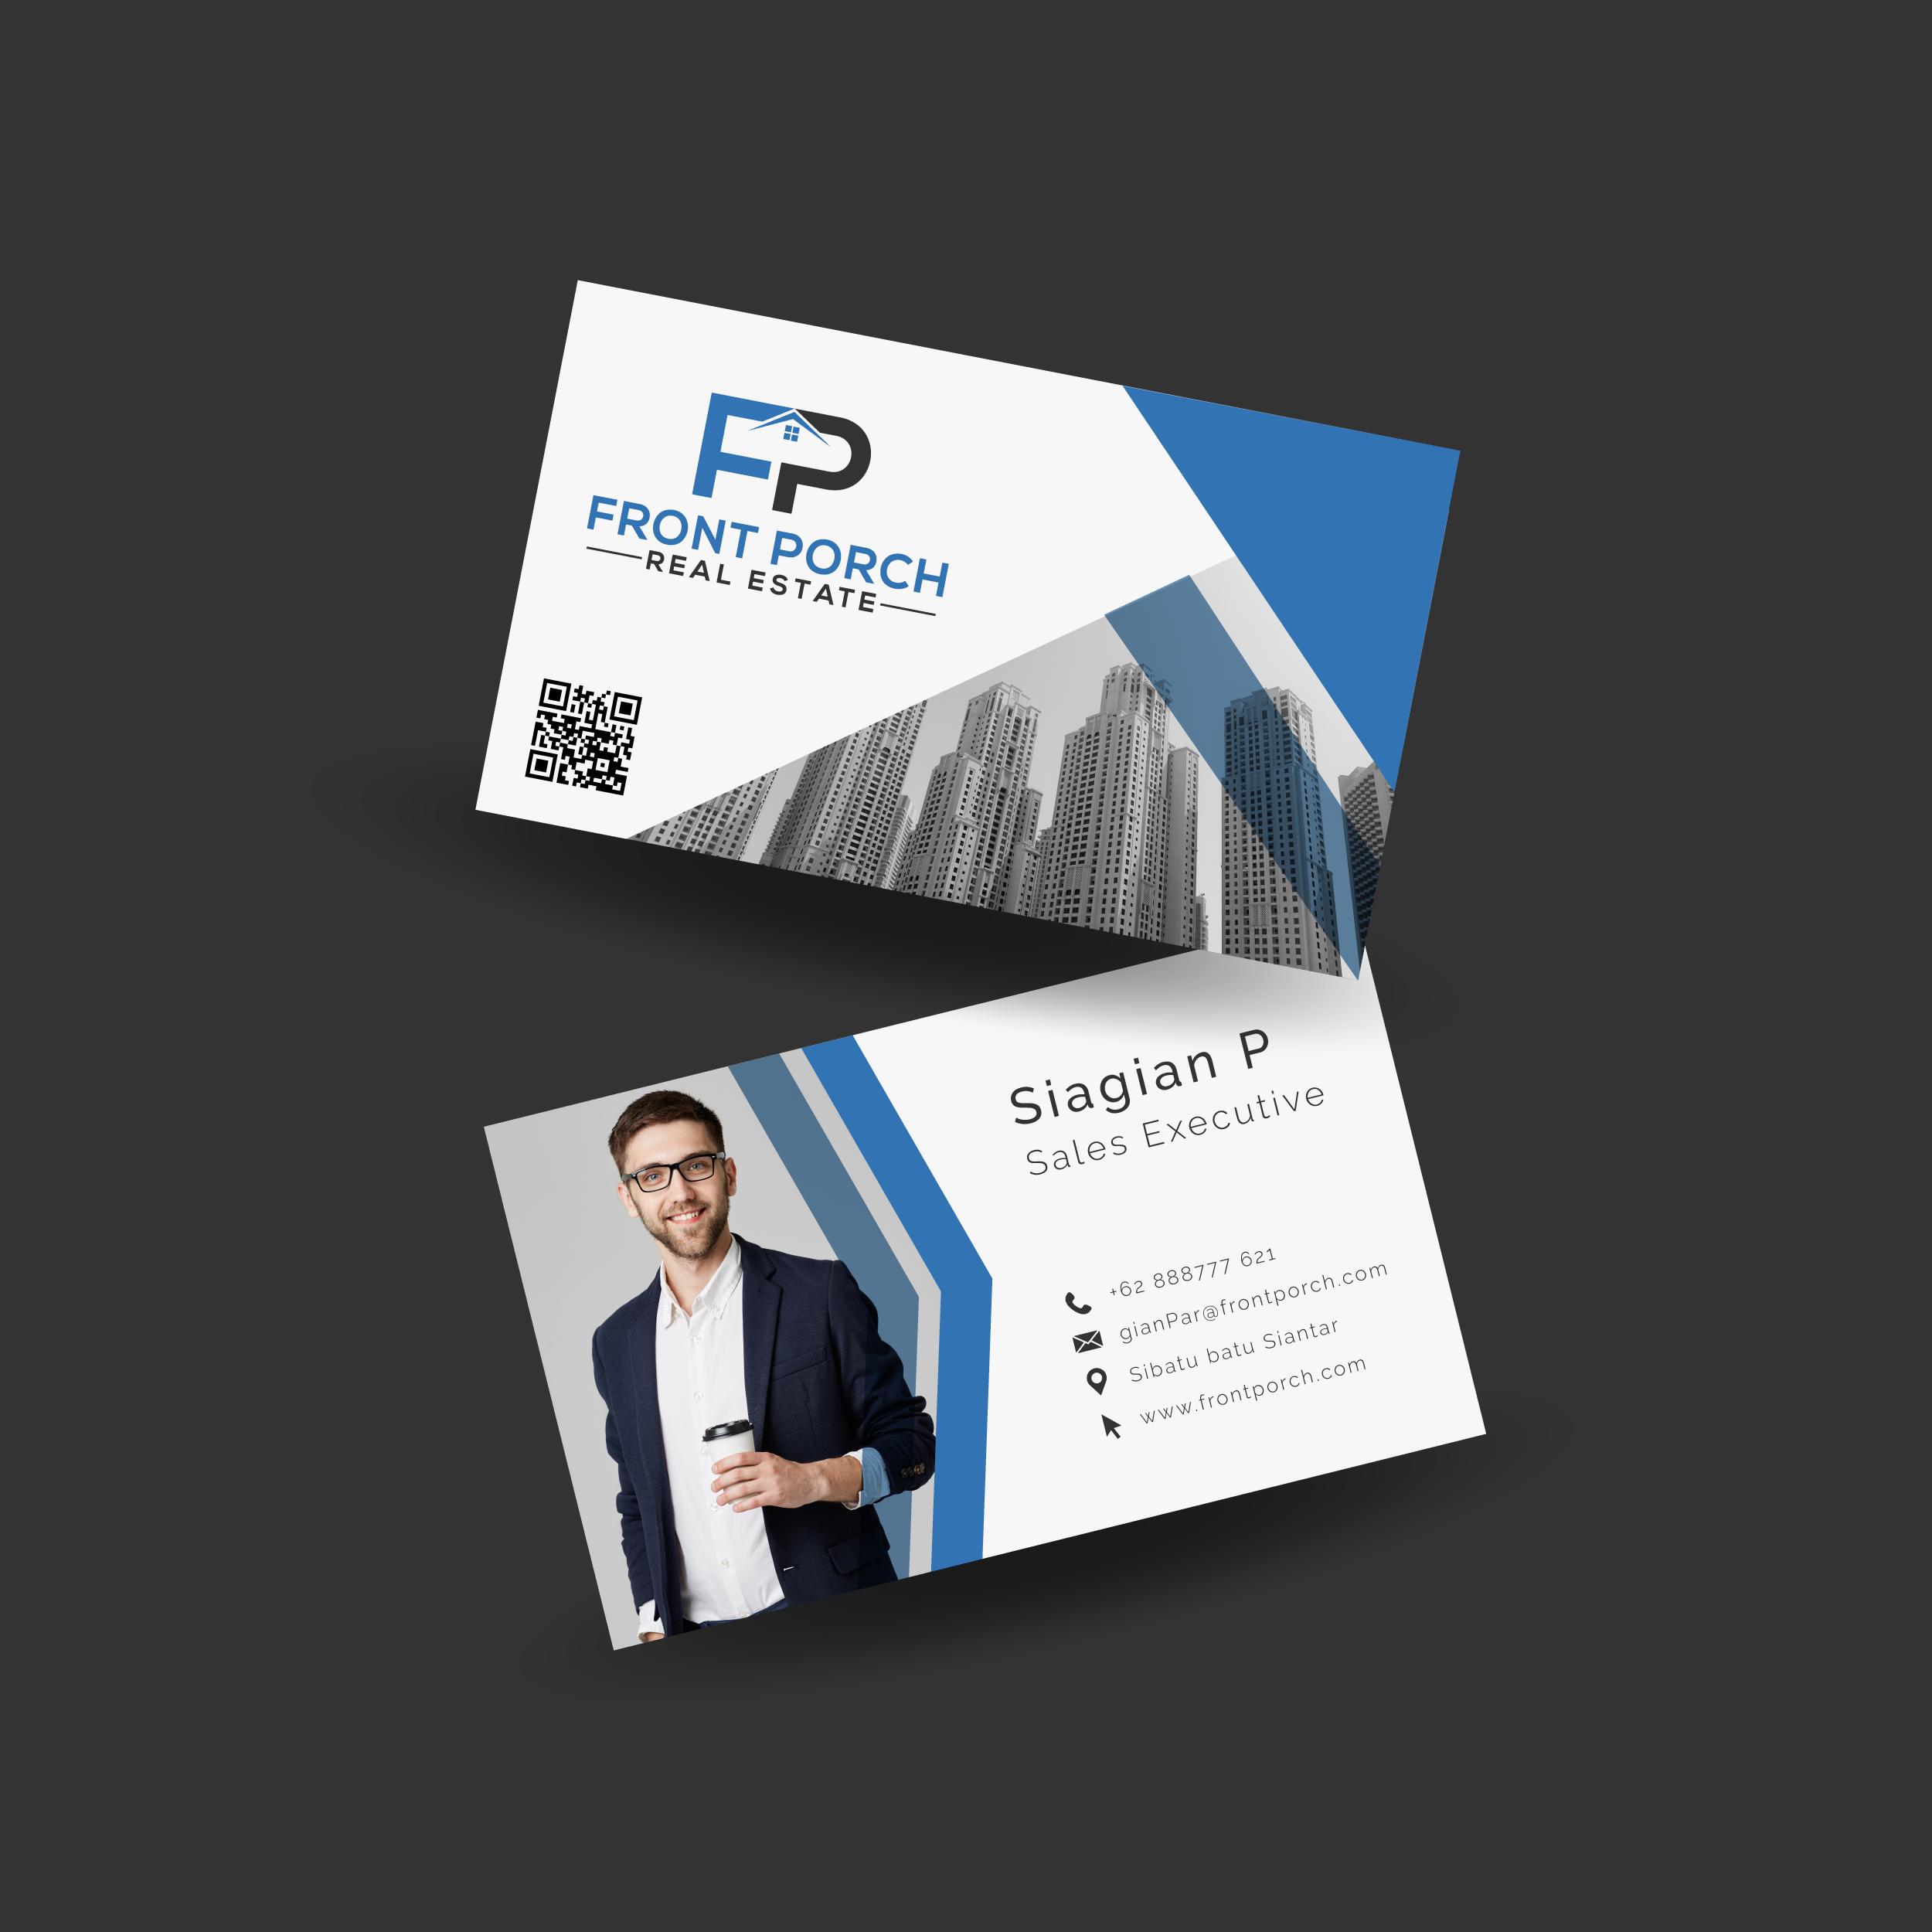 Business Card Design In 2020 Business Card Design Elegant Business Cards Graphic Design Services